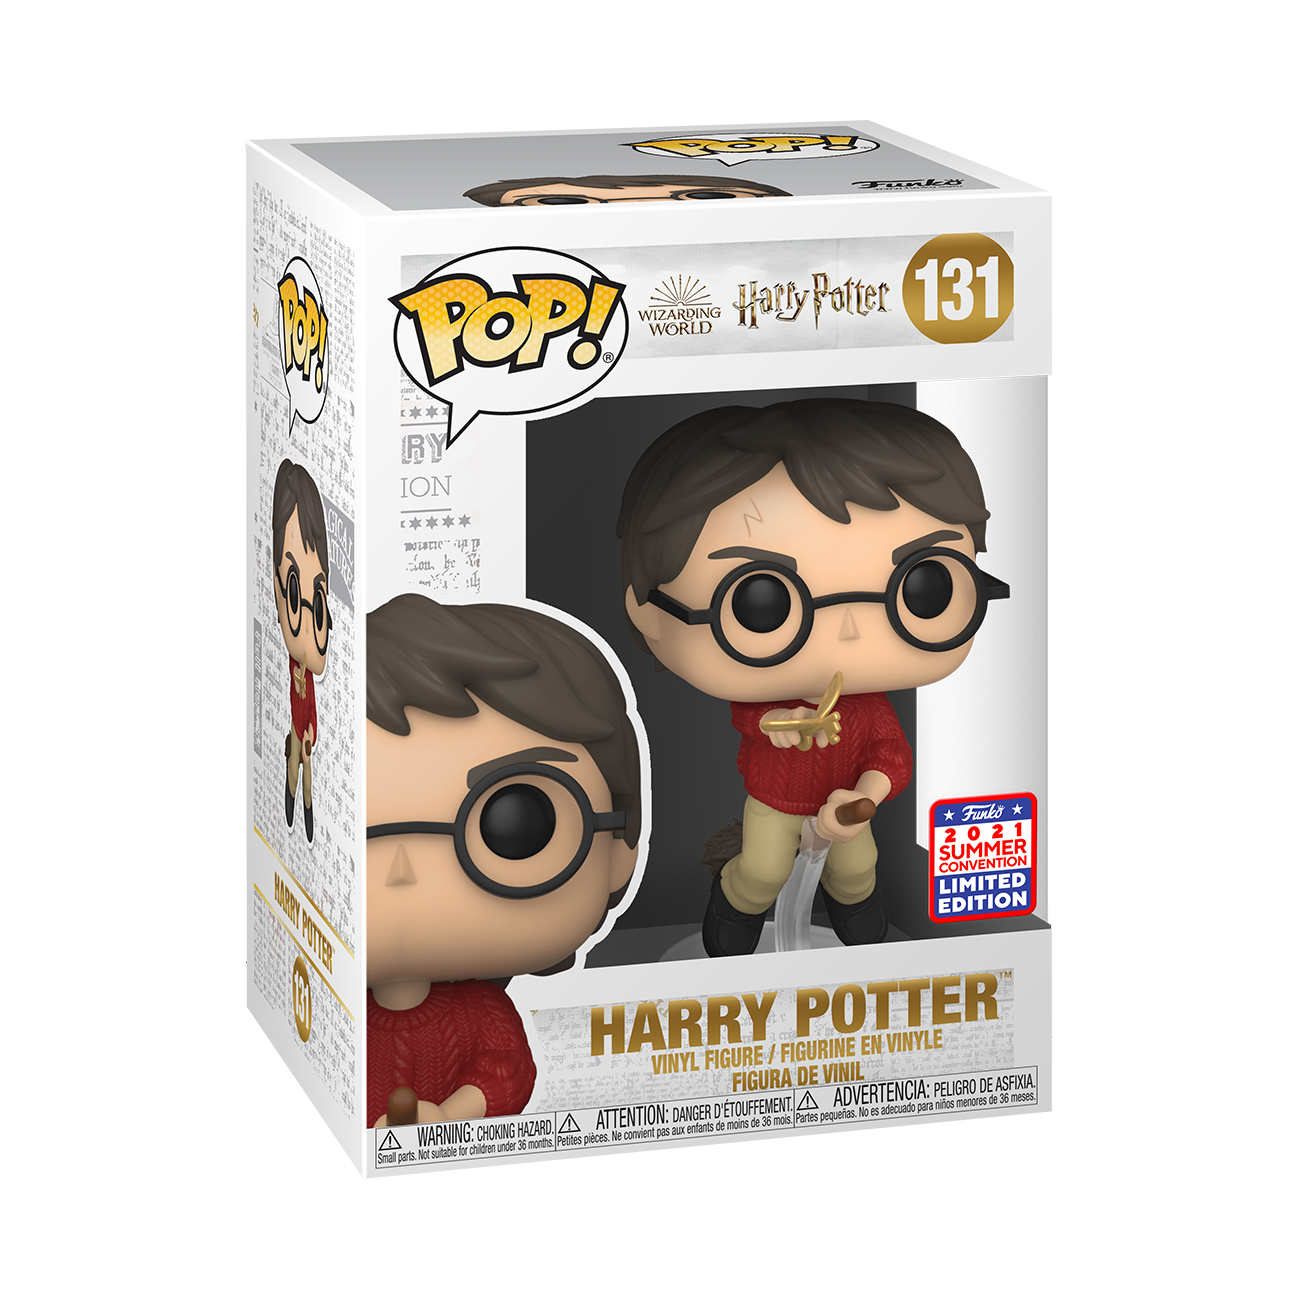 Harry Potter- Harry Potter with Wingkey Pop! Vinyl Figure